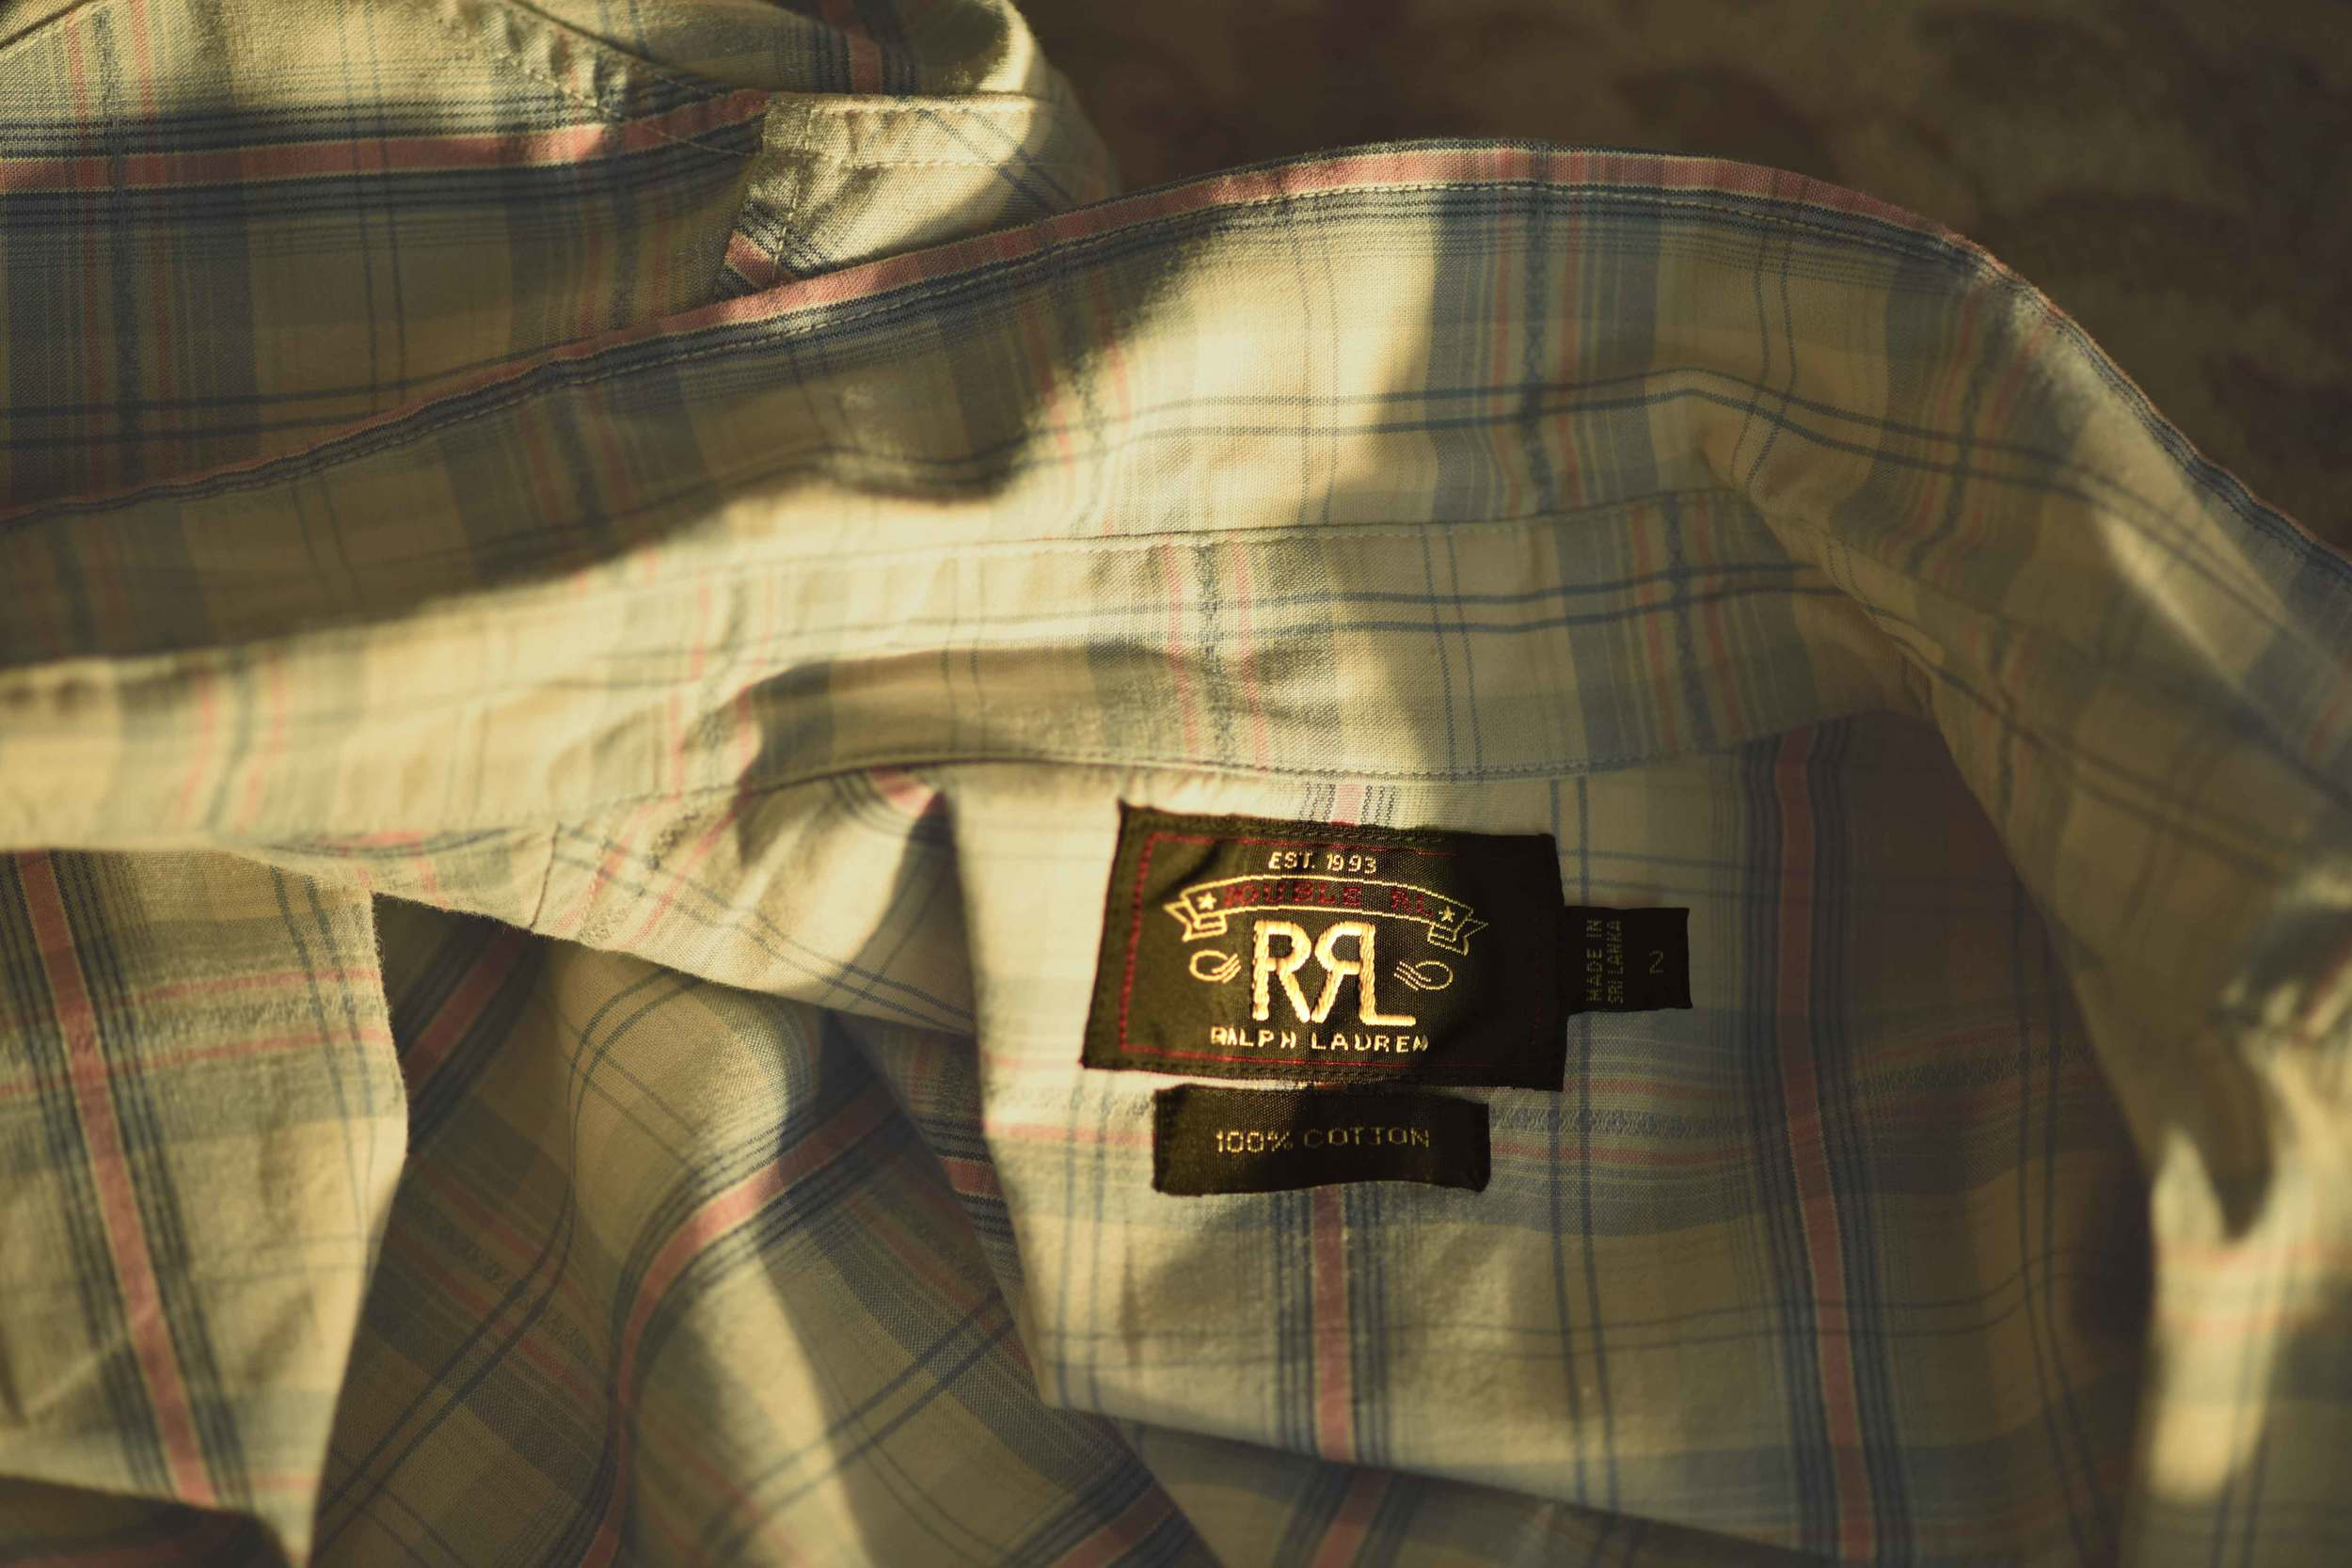 The Ralph Lauren RRL (double RL) western shirt label. Image©sourcingstyle.com